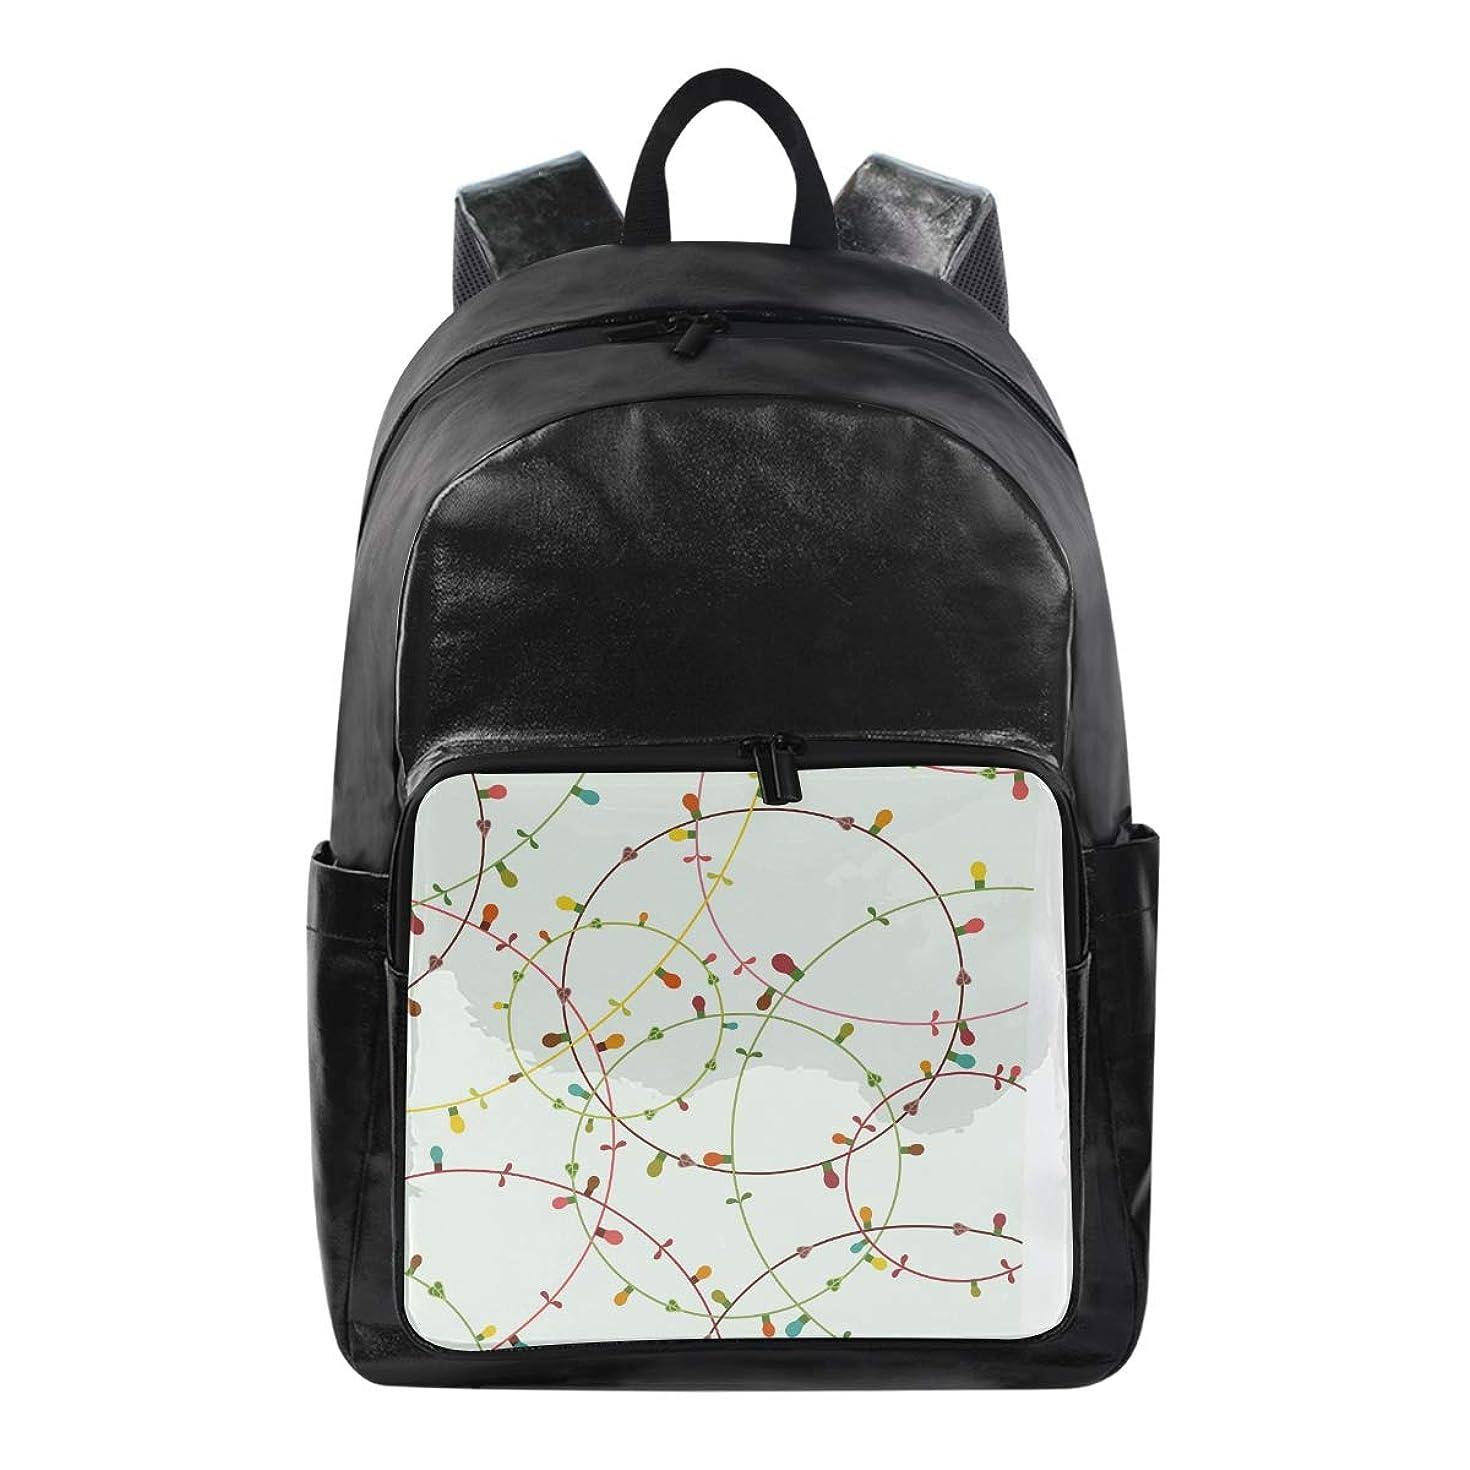 Backpack Color Lamp Bag Student Stylish Unisex Laptop Waterproof School Kindergarten Bag Rucksack for Teen Boys and Girls